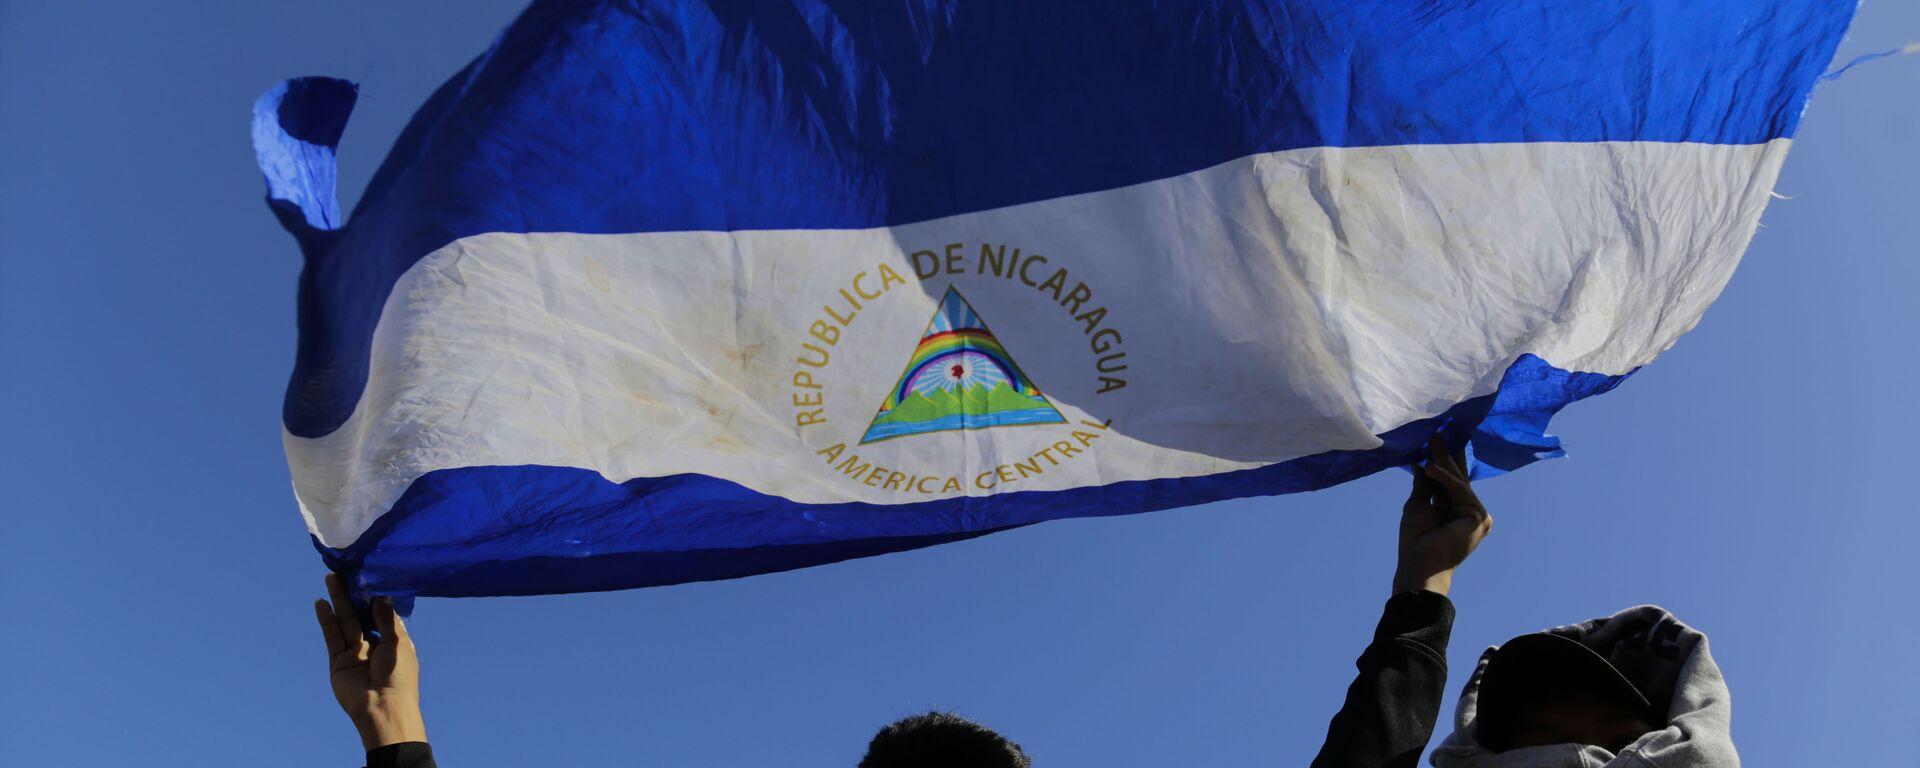 Bandera de Nicaragua - Sputnik Mundo, 1920, 20.09.2021